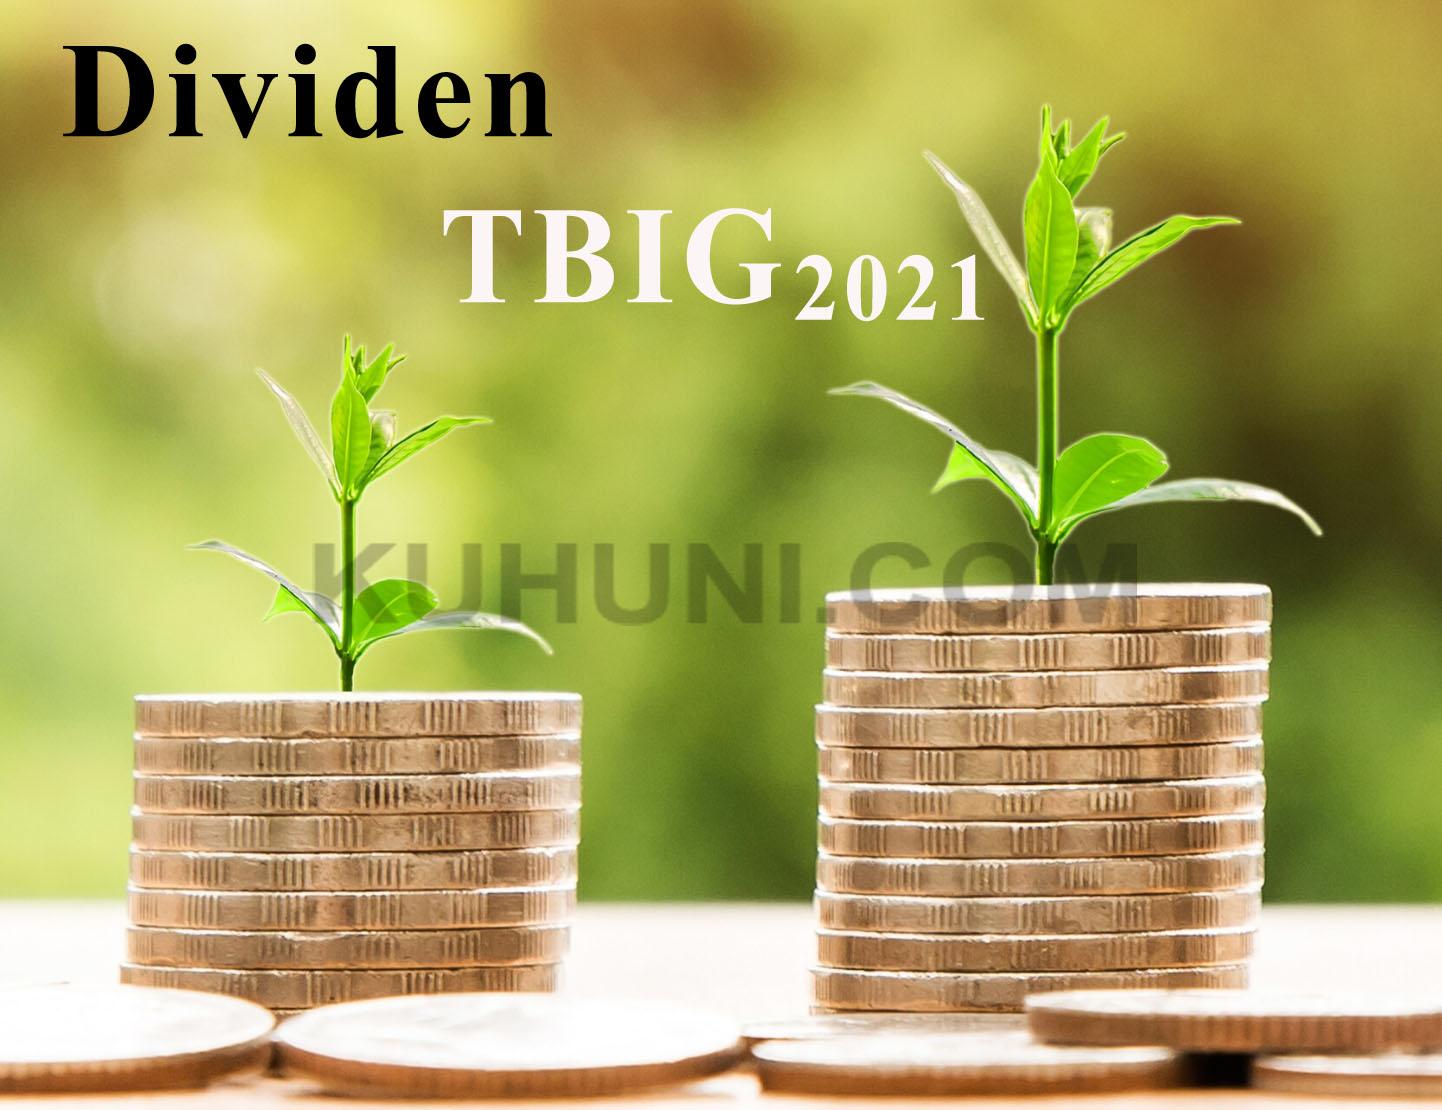 Dividen TBIG 2021